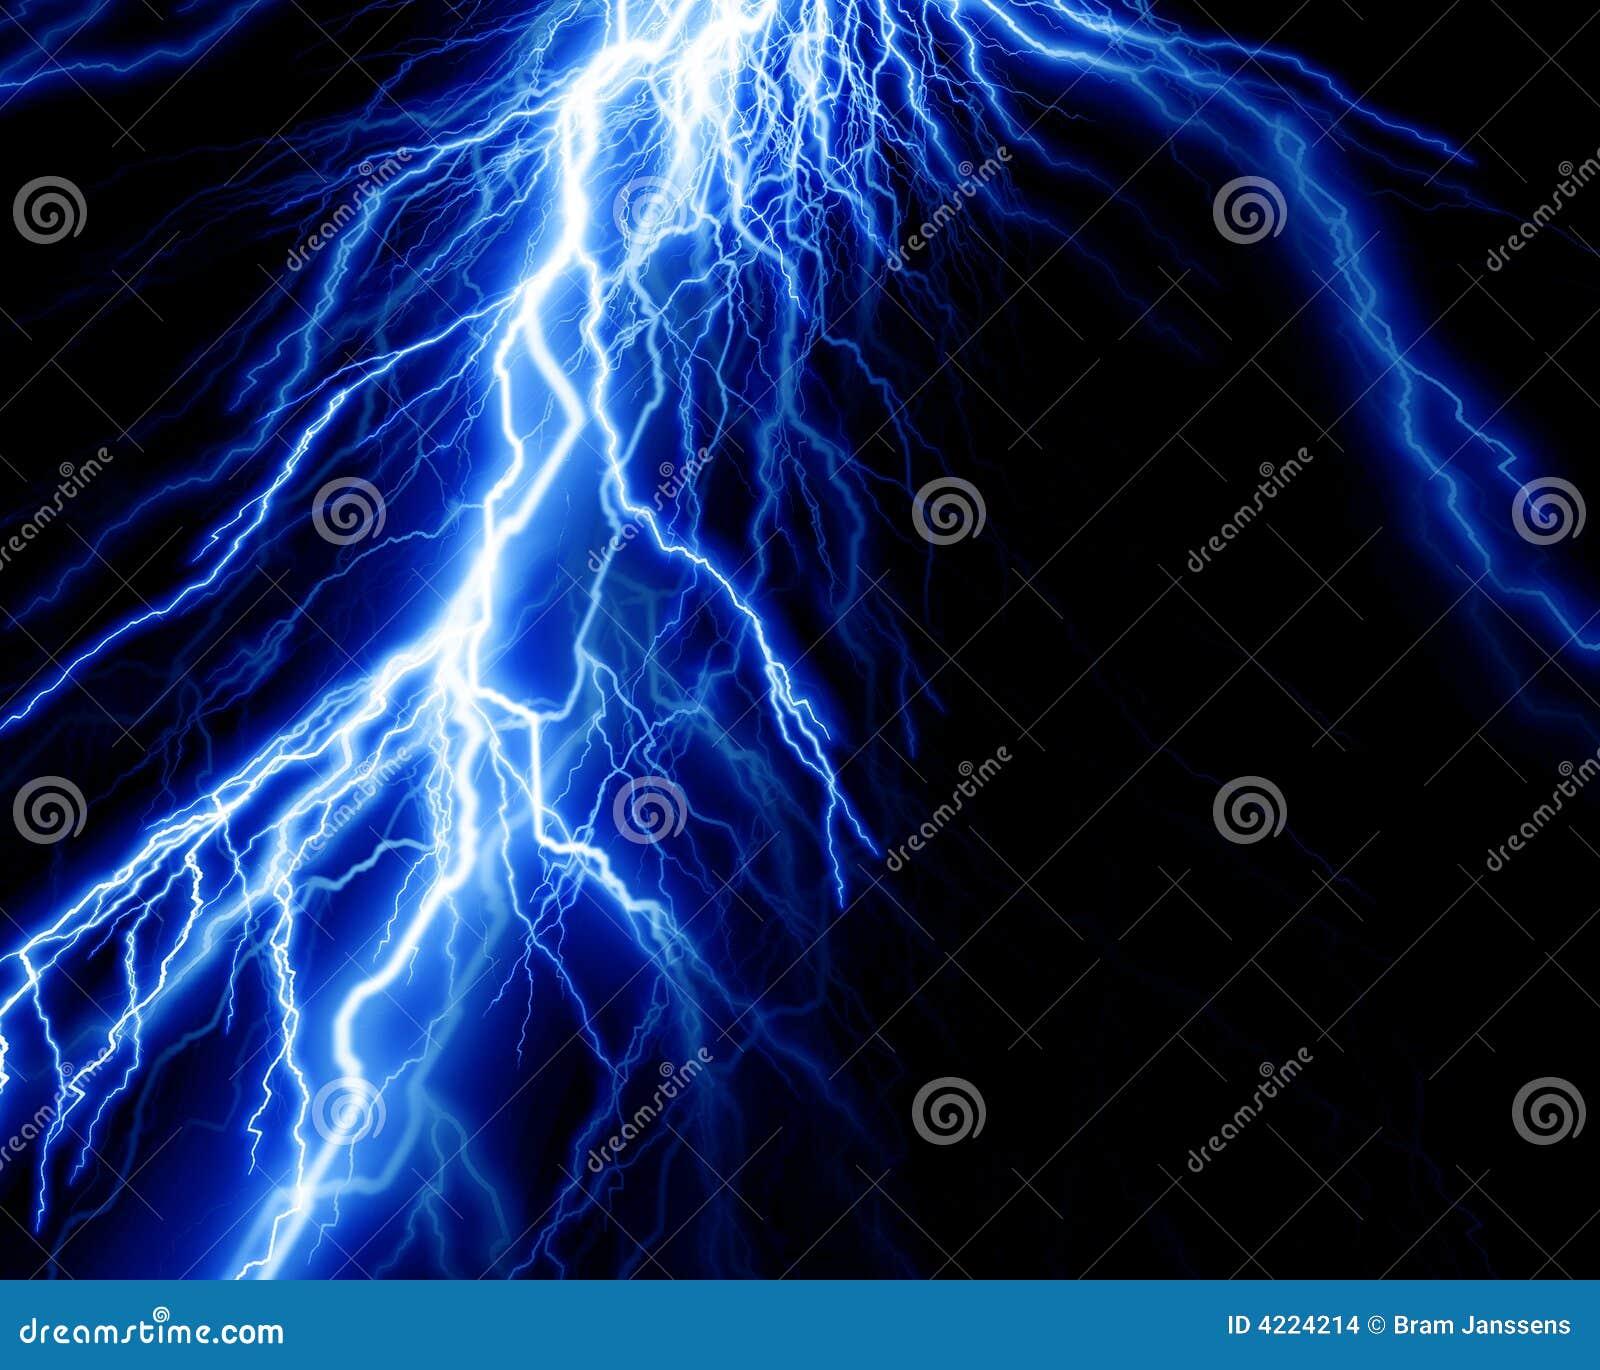 强烈的�y`�K���_强烈的闪电